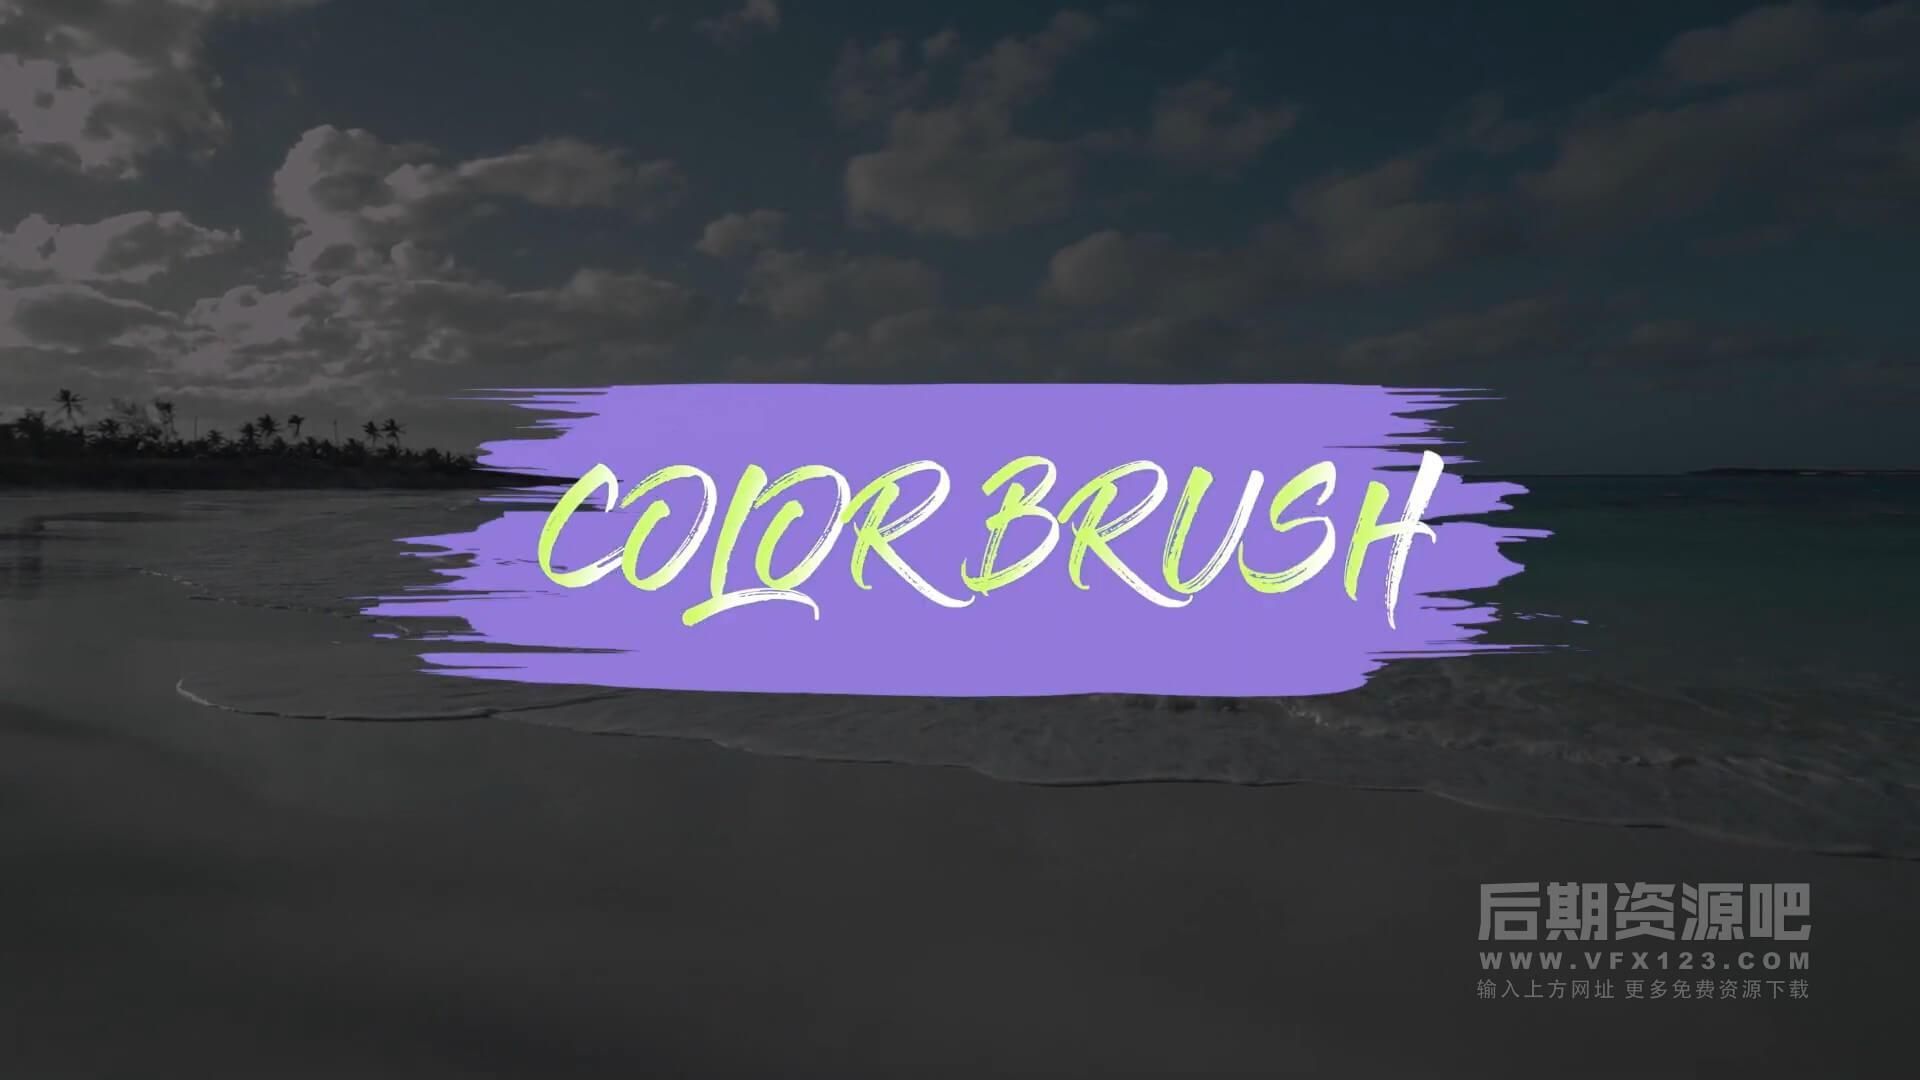 fcpx转场插件 17组手绘彩色笔刷效果过渡转场预设 Color brush transition